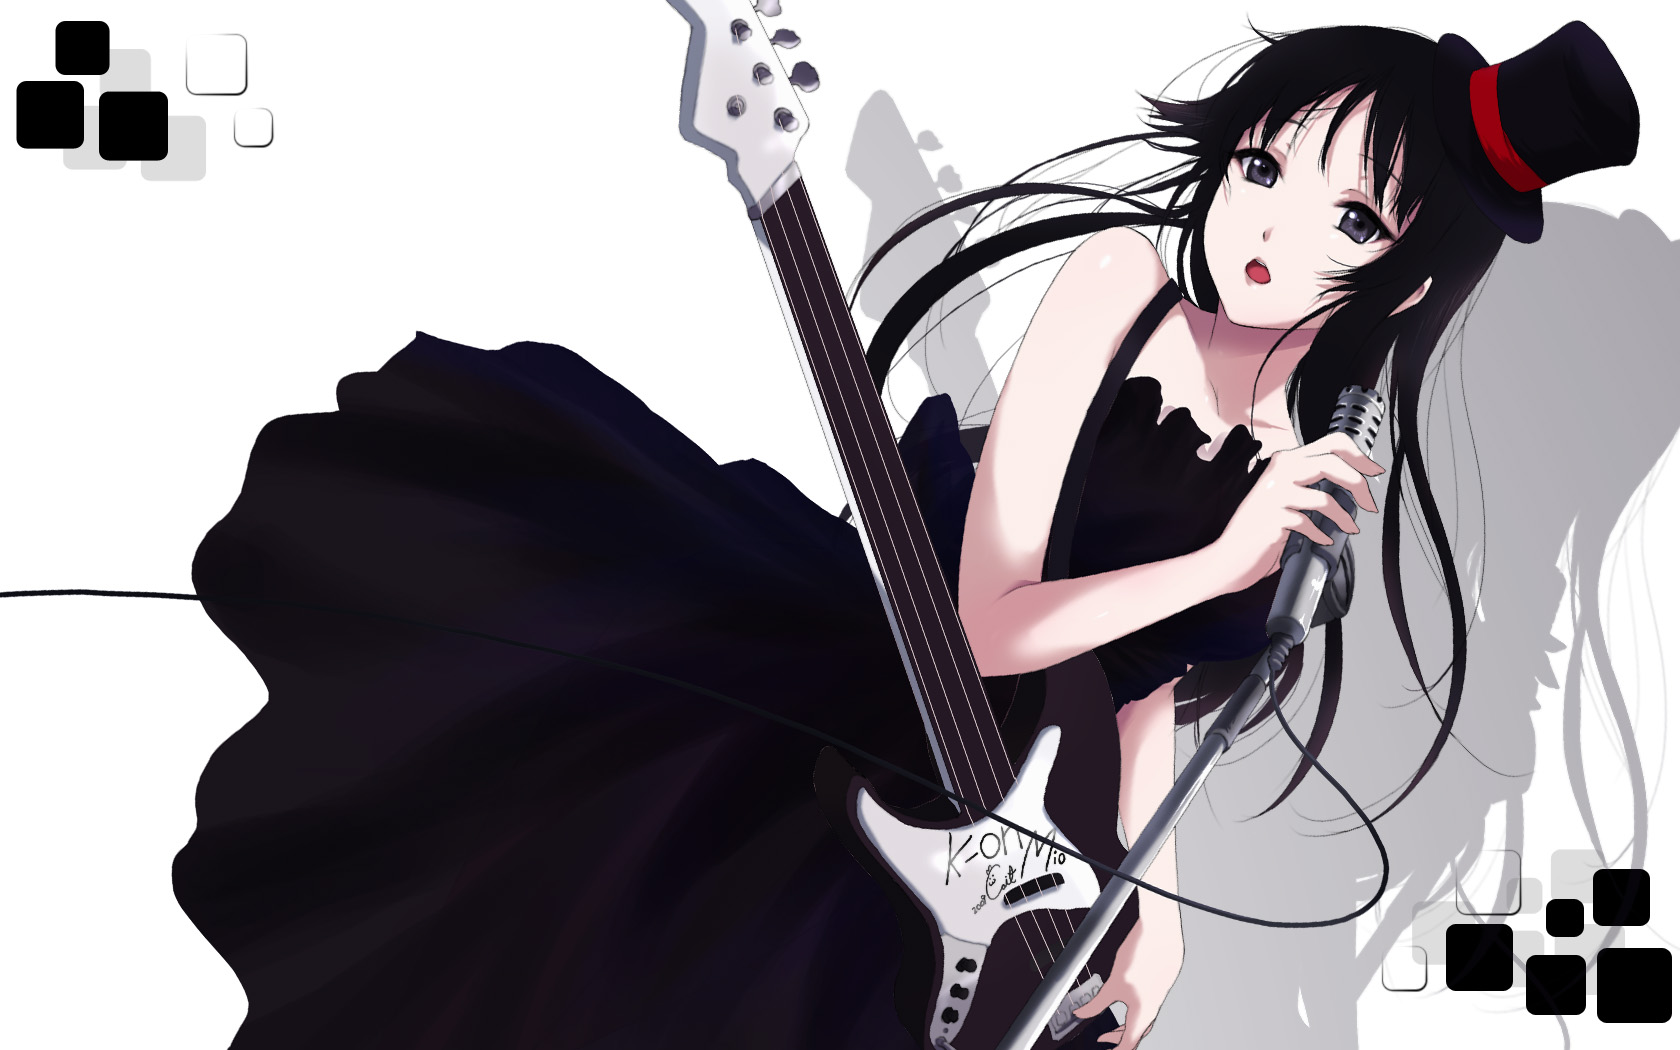 akiyama_mio black_hair cait dress goth-loli gray_eyes guitar hat instrument k-on! lolita_fashion long_hair microphone signed white